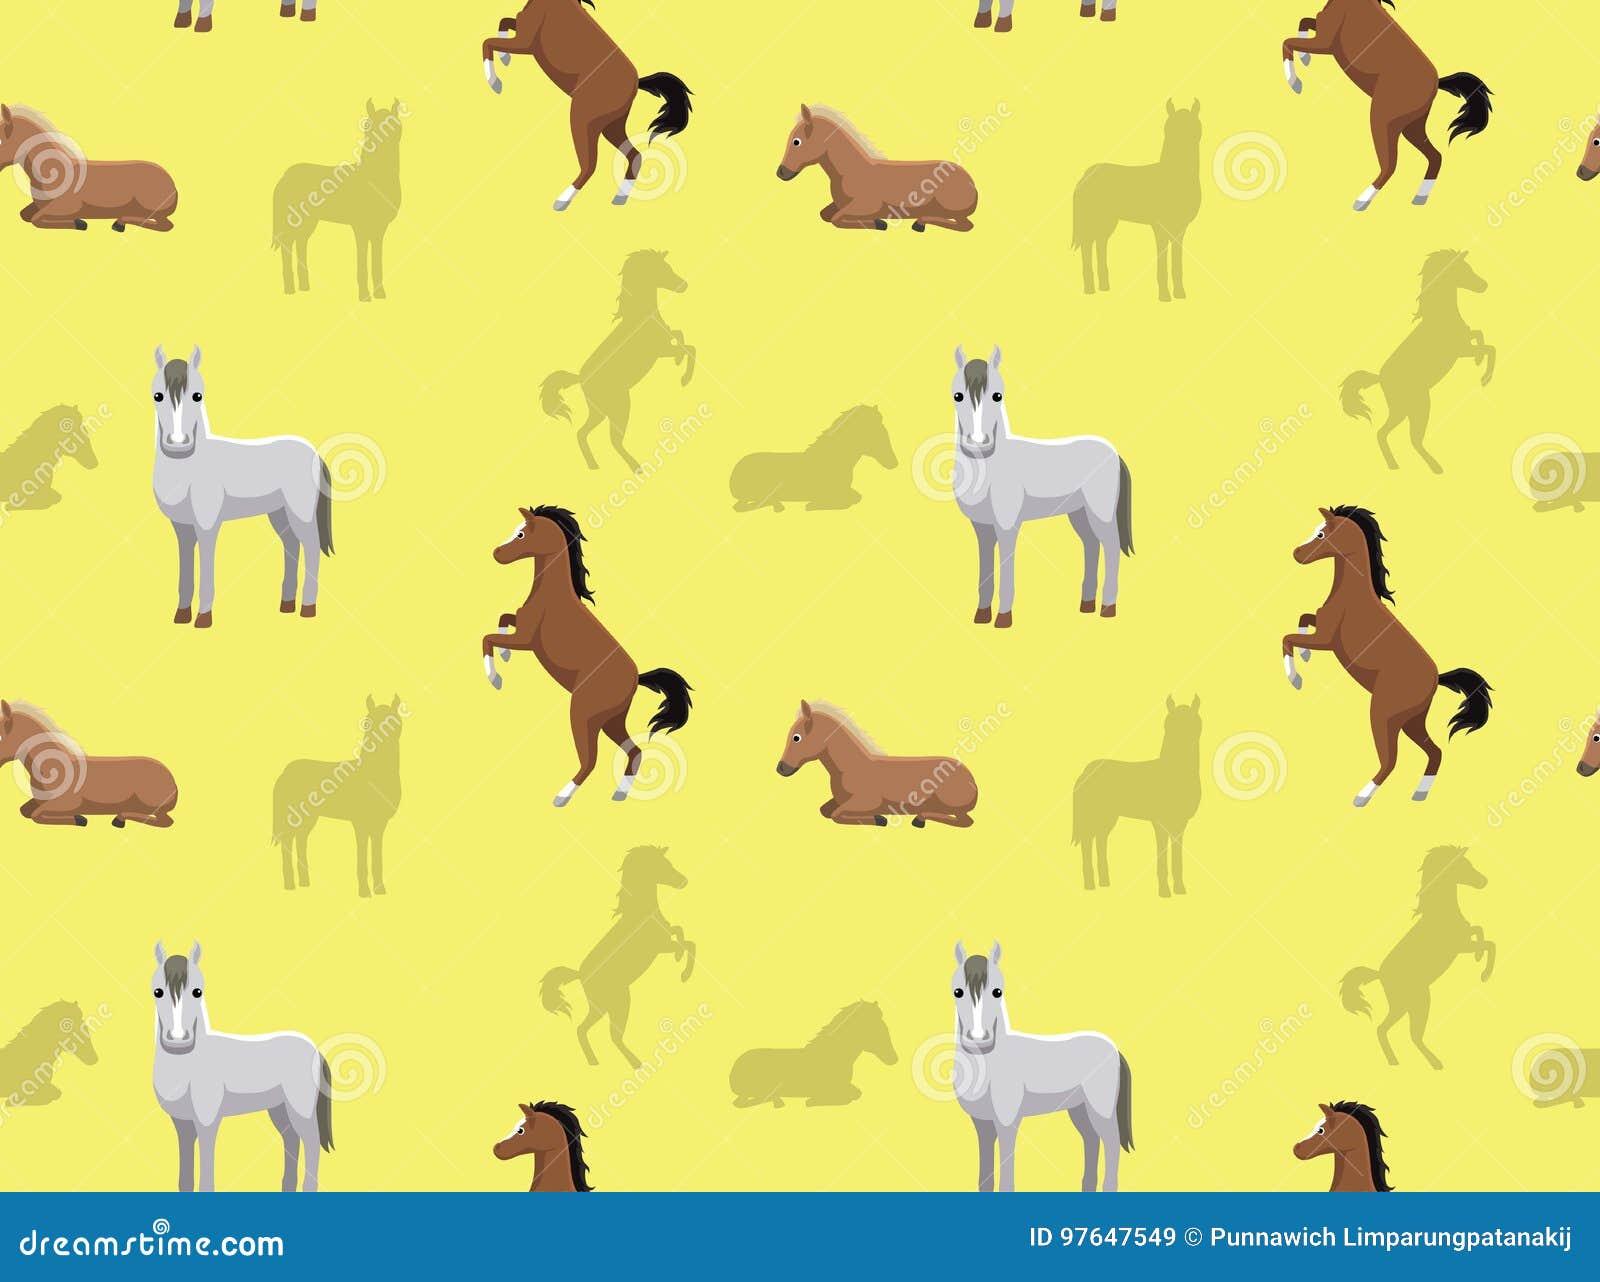 Horse Wallpaper 2 Stock Vector Illustration Of Domestic 97647549